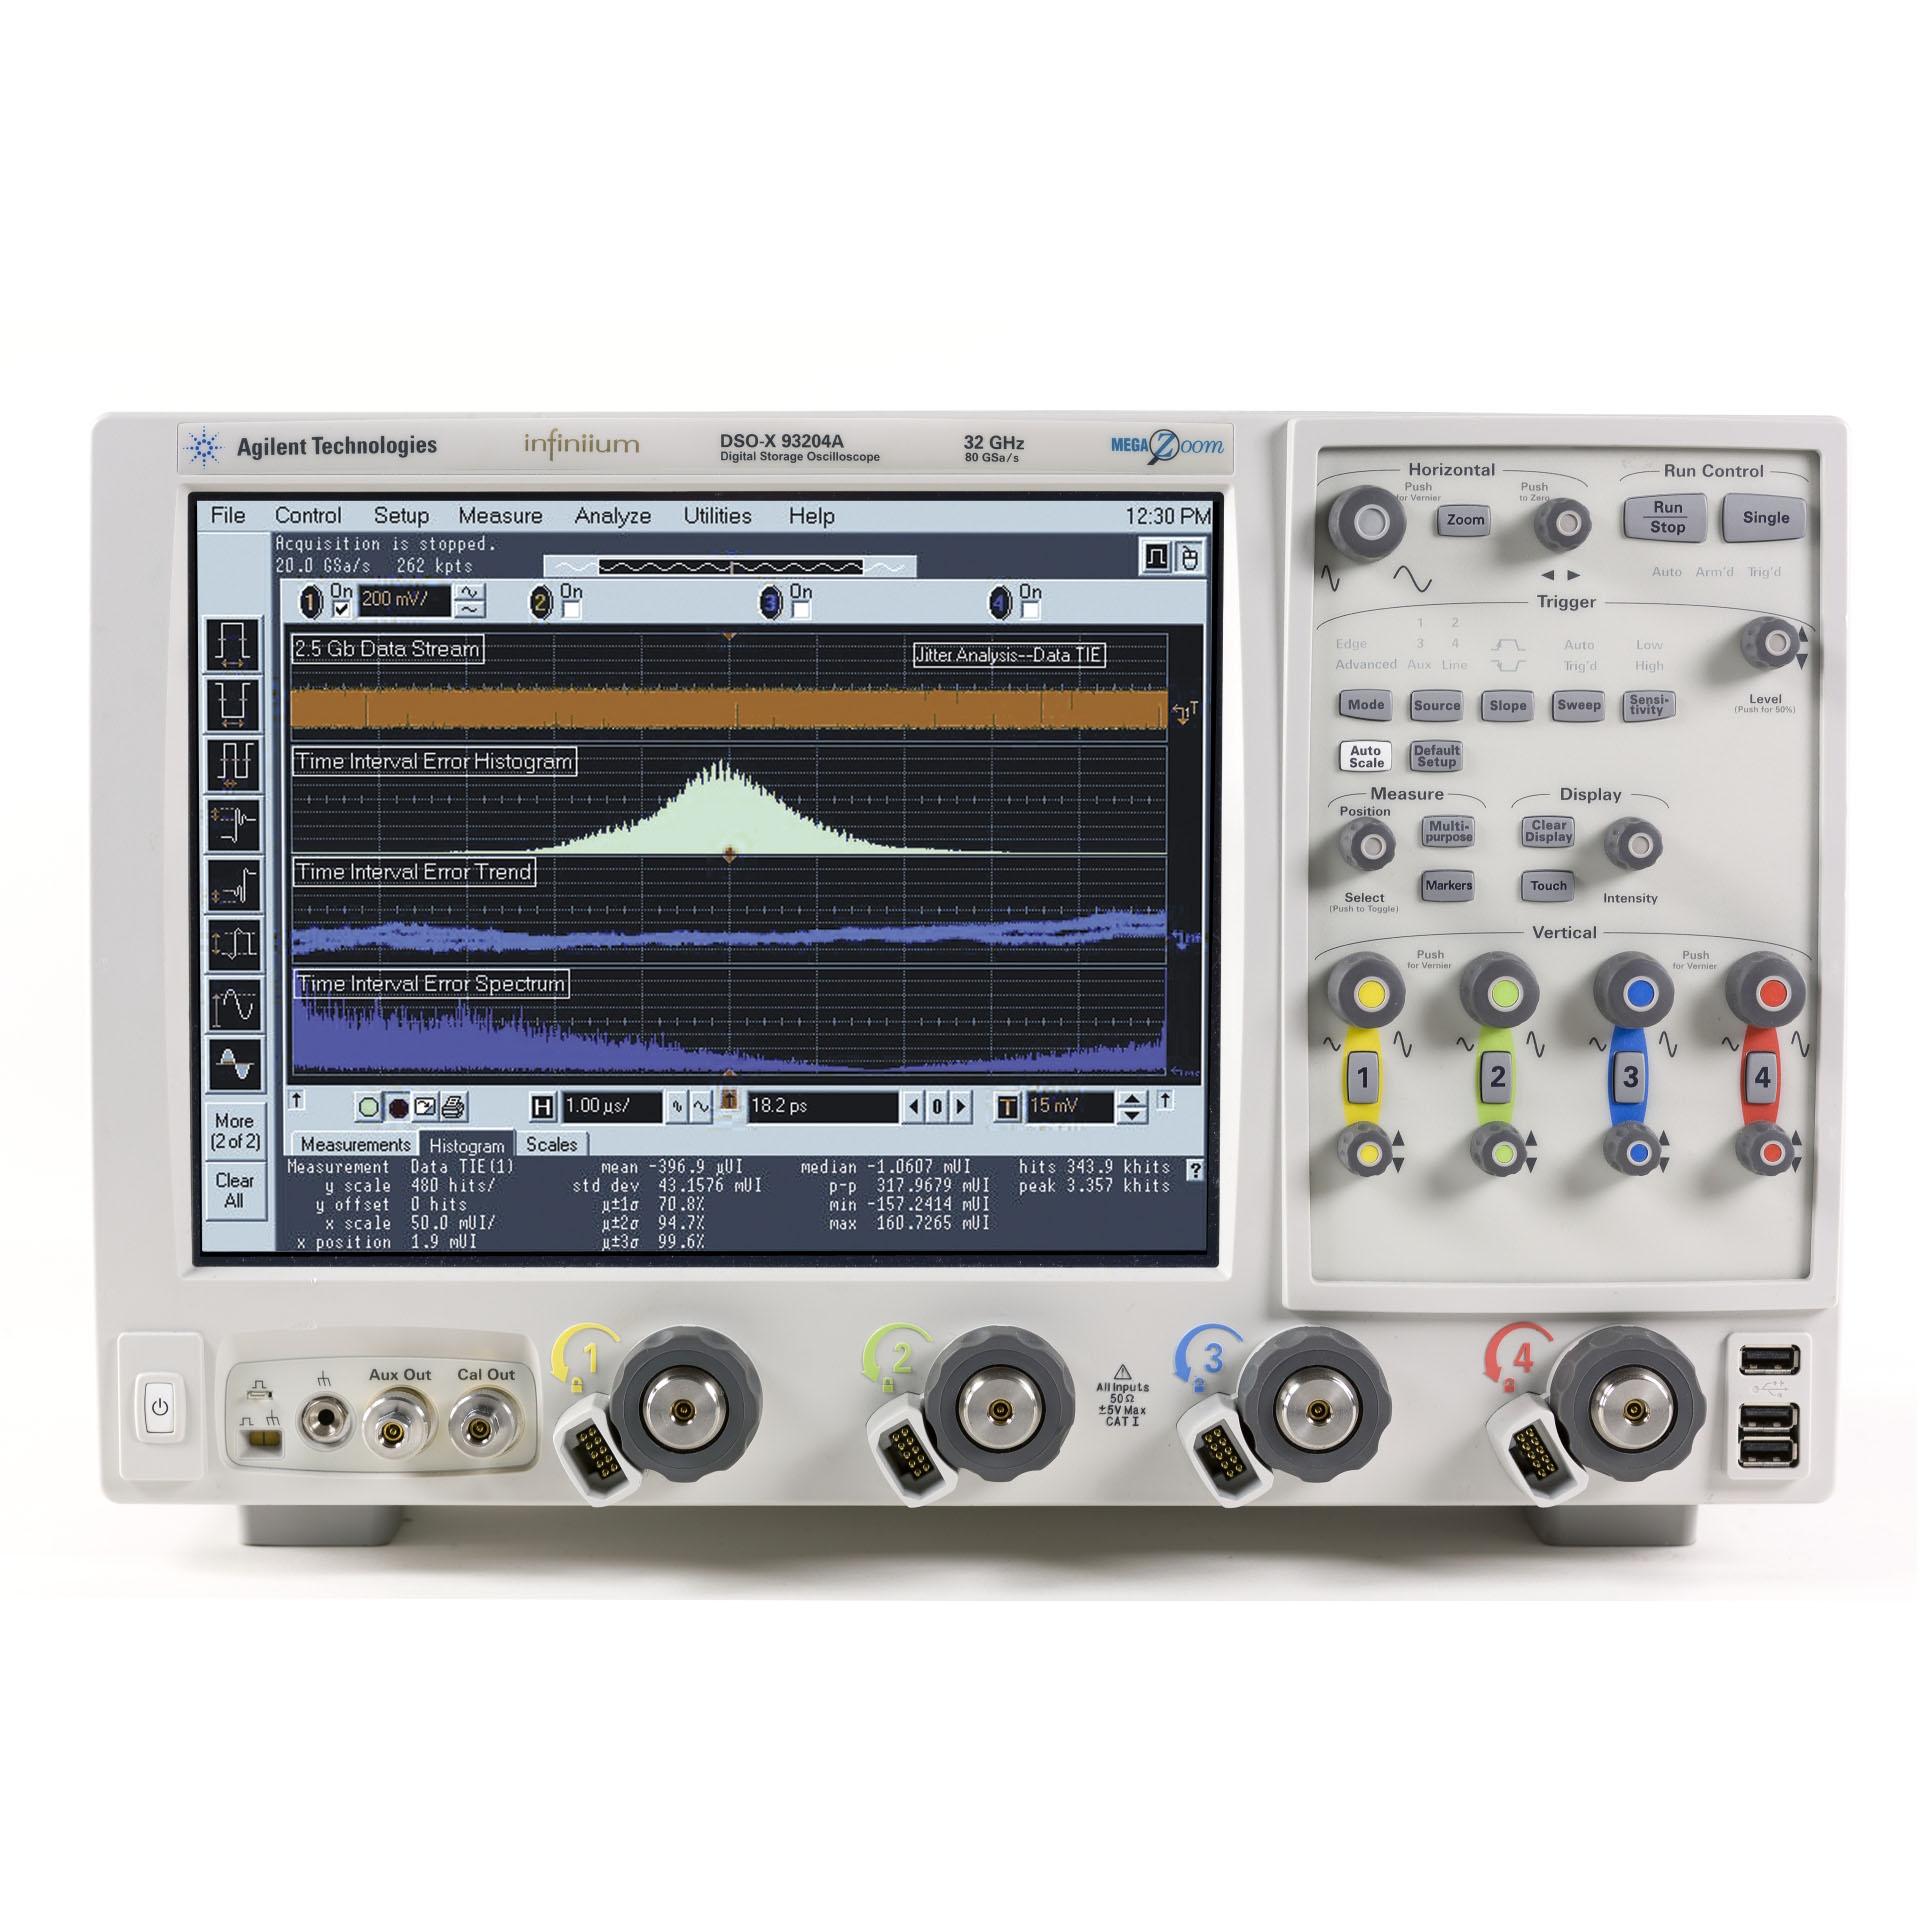 DSOX93204A/061,800,805,N5384A-1FP,N5400A-1FP デジタルオシロスコープ